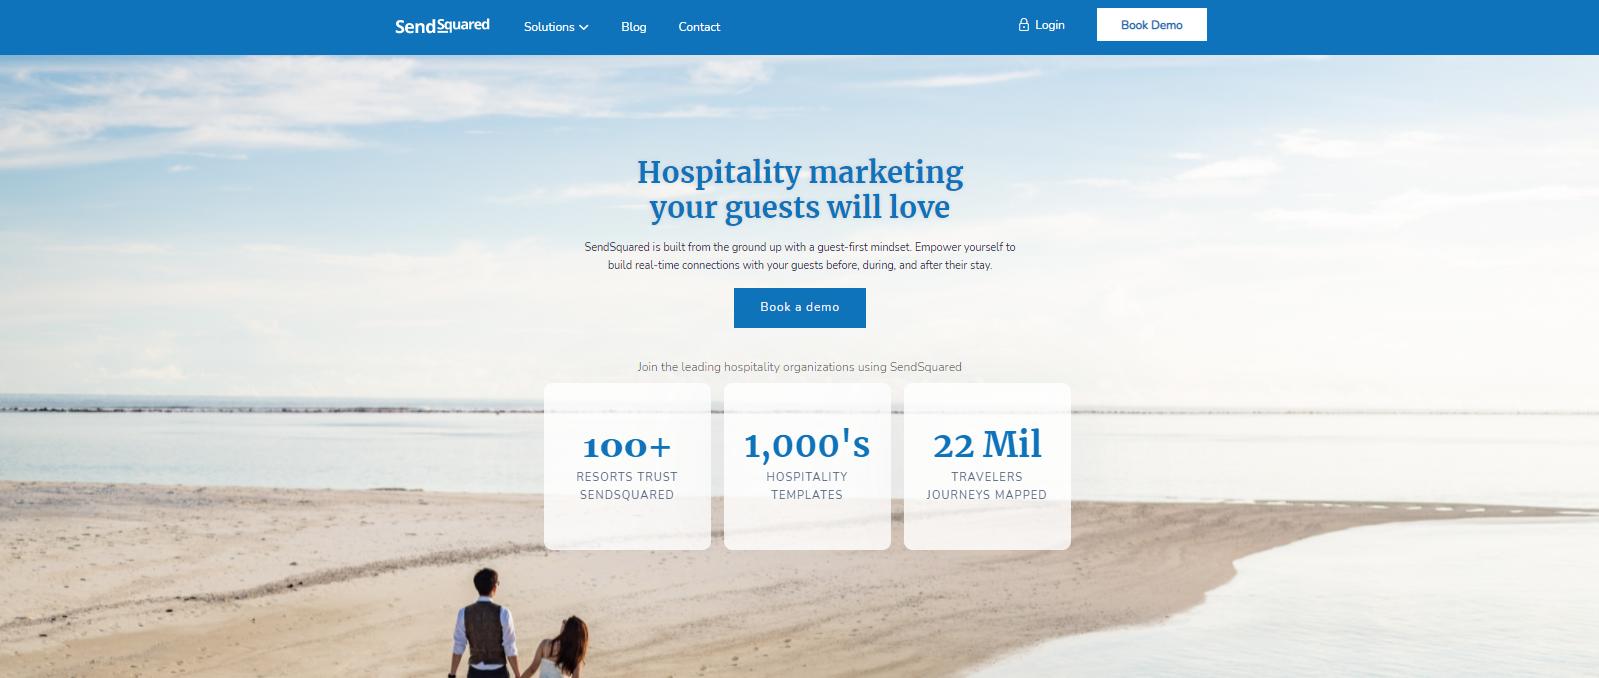 SendSquared-Hospitality-Marketing-Platform